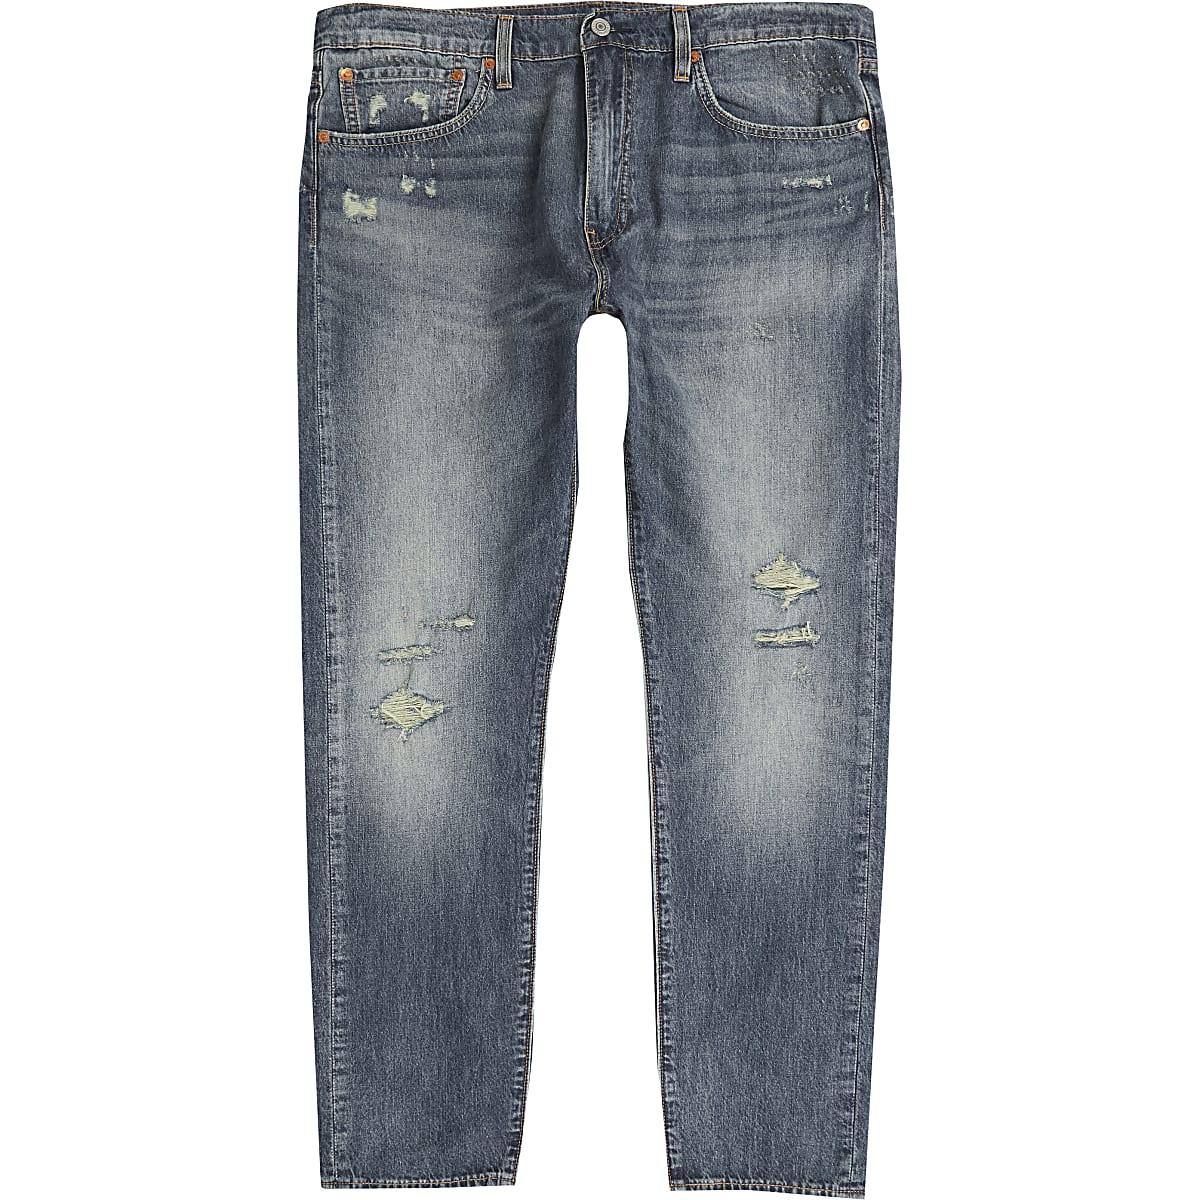 Levi's – 512 – Blaue Jeans im Used-Look